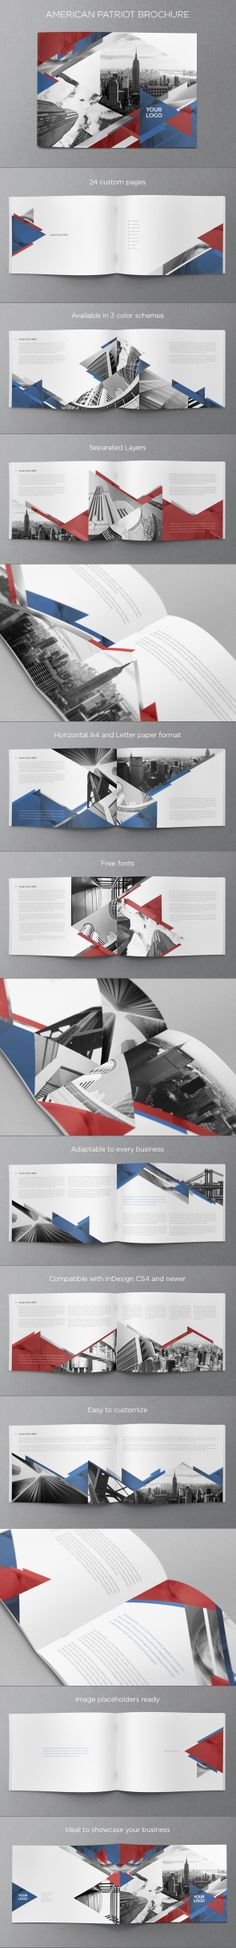 American Patriot Brochure. Download here: http://graphicriver.net/item/american-patriot-brochure/6339354?ref=abradesign #design #brochure